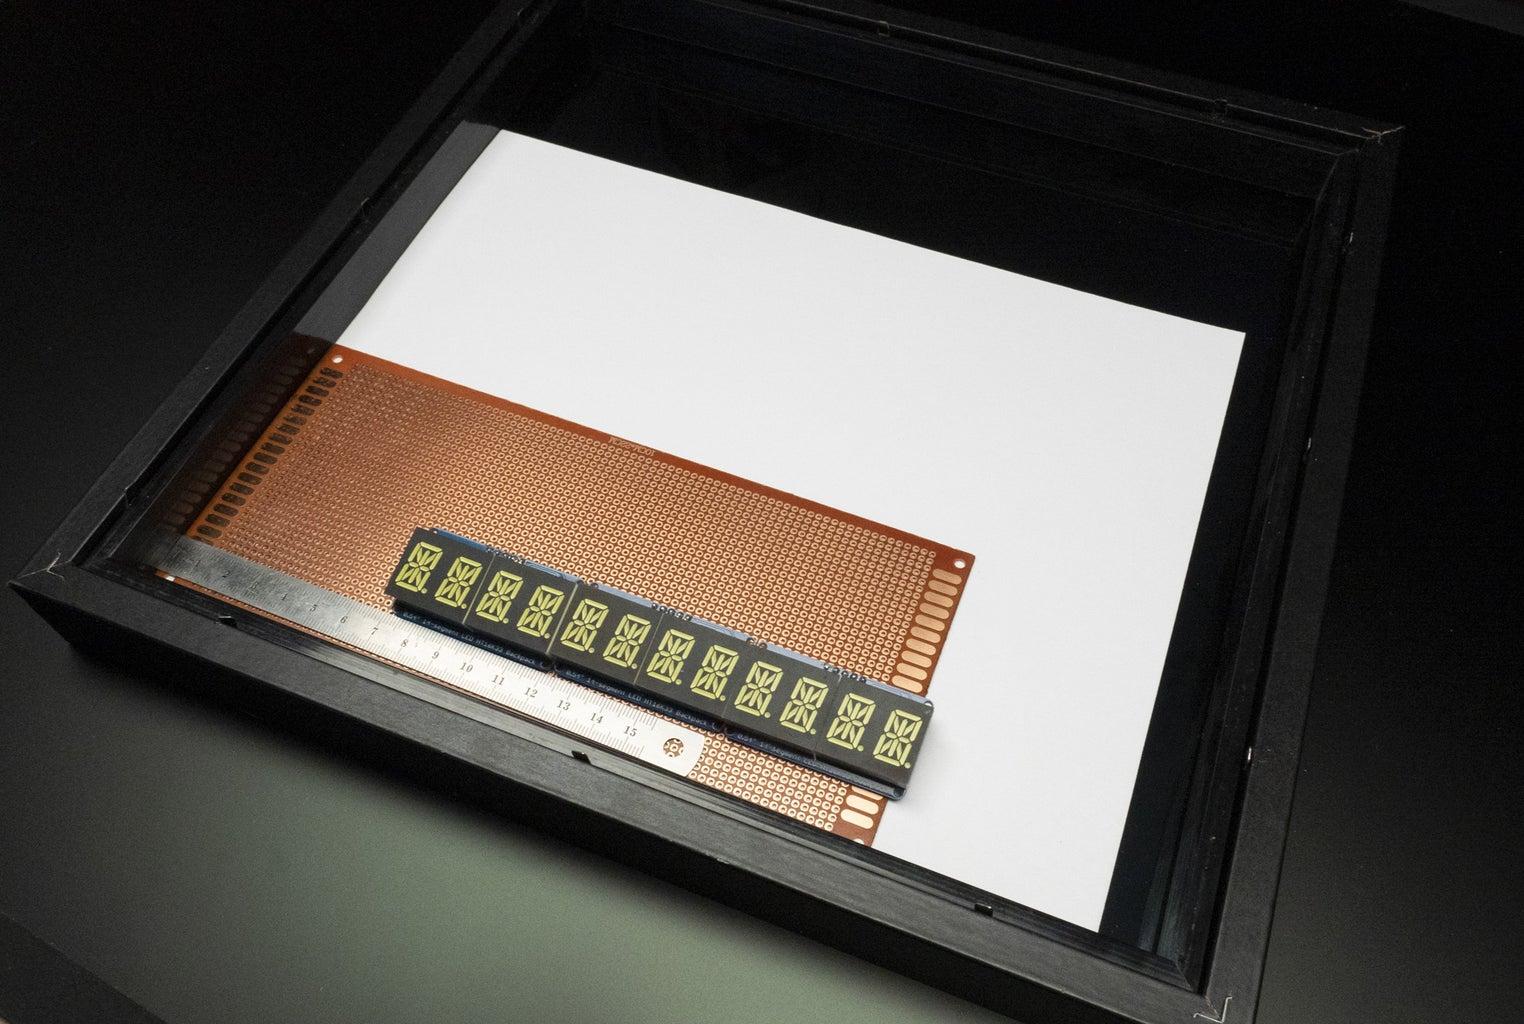 Determine Display Layout Inside Frame and Solder Displays